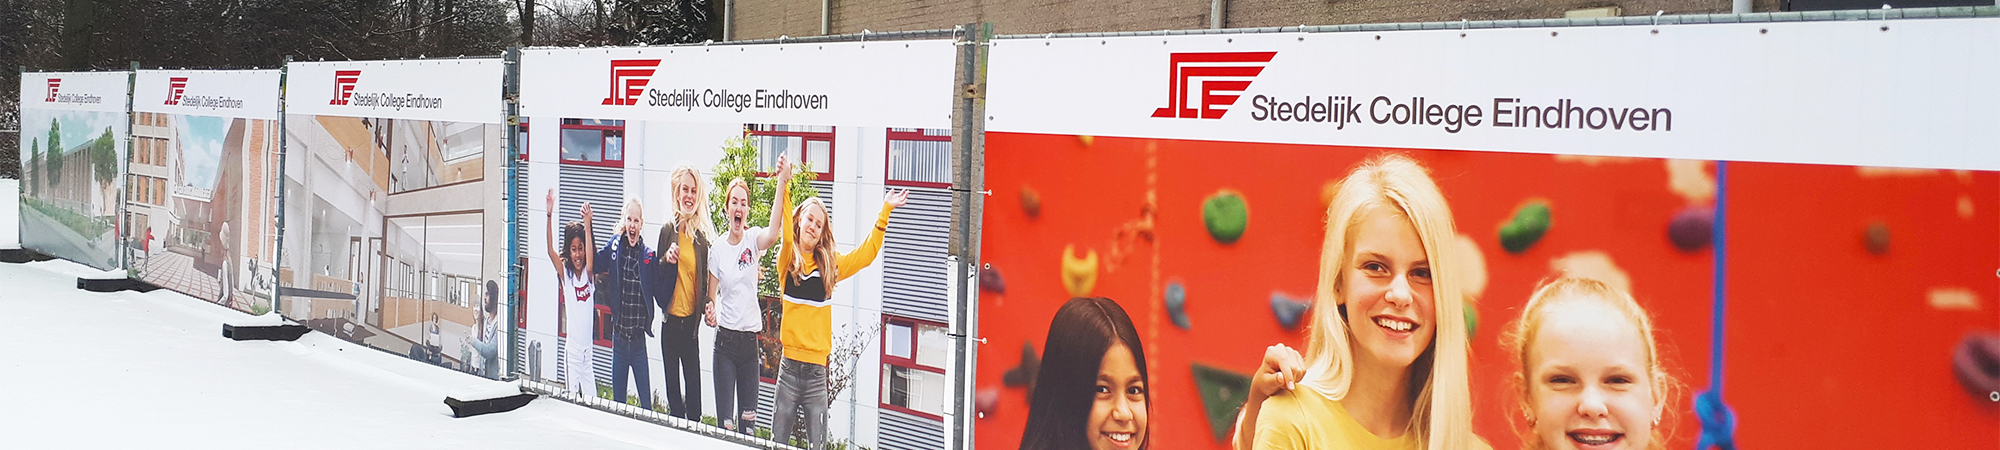 Bouwhekdoek - Stedelijk College Eindhoven